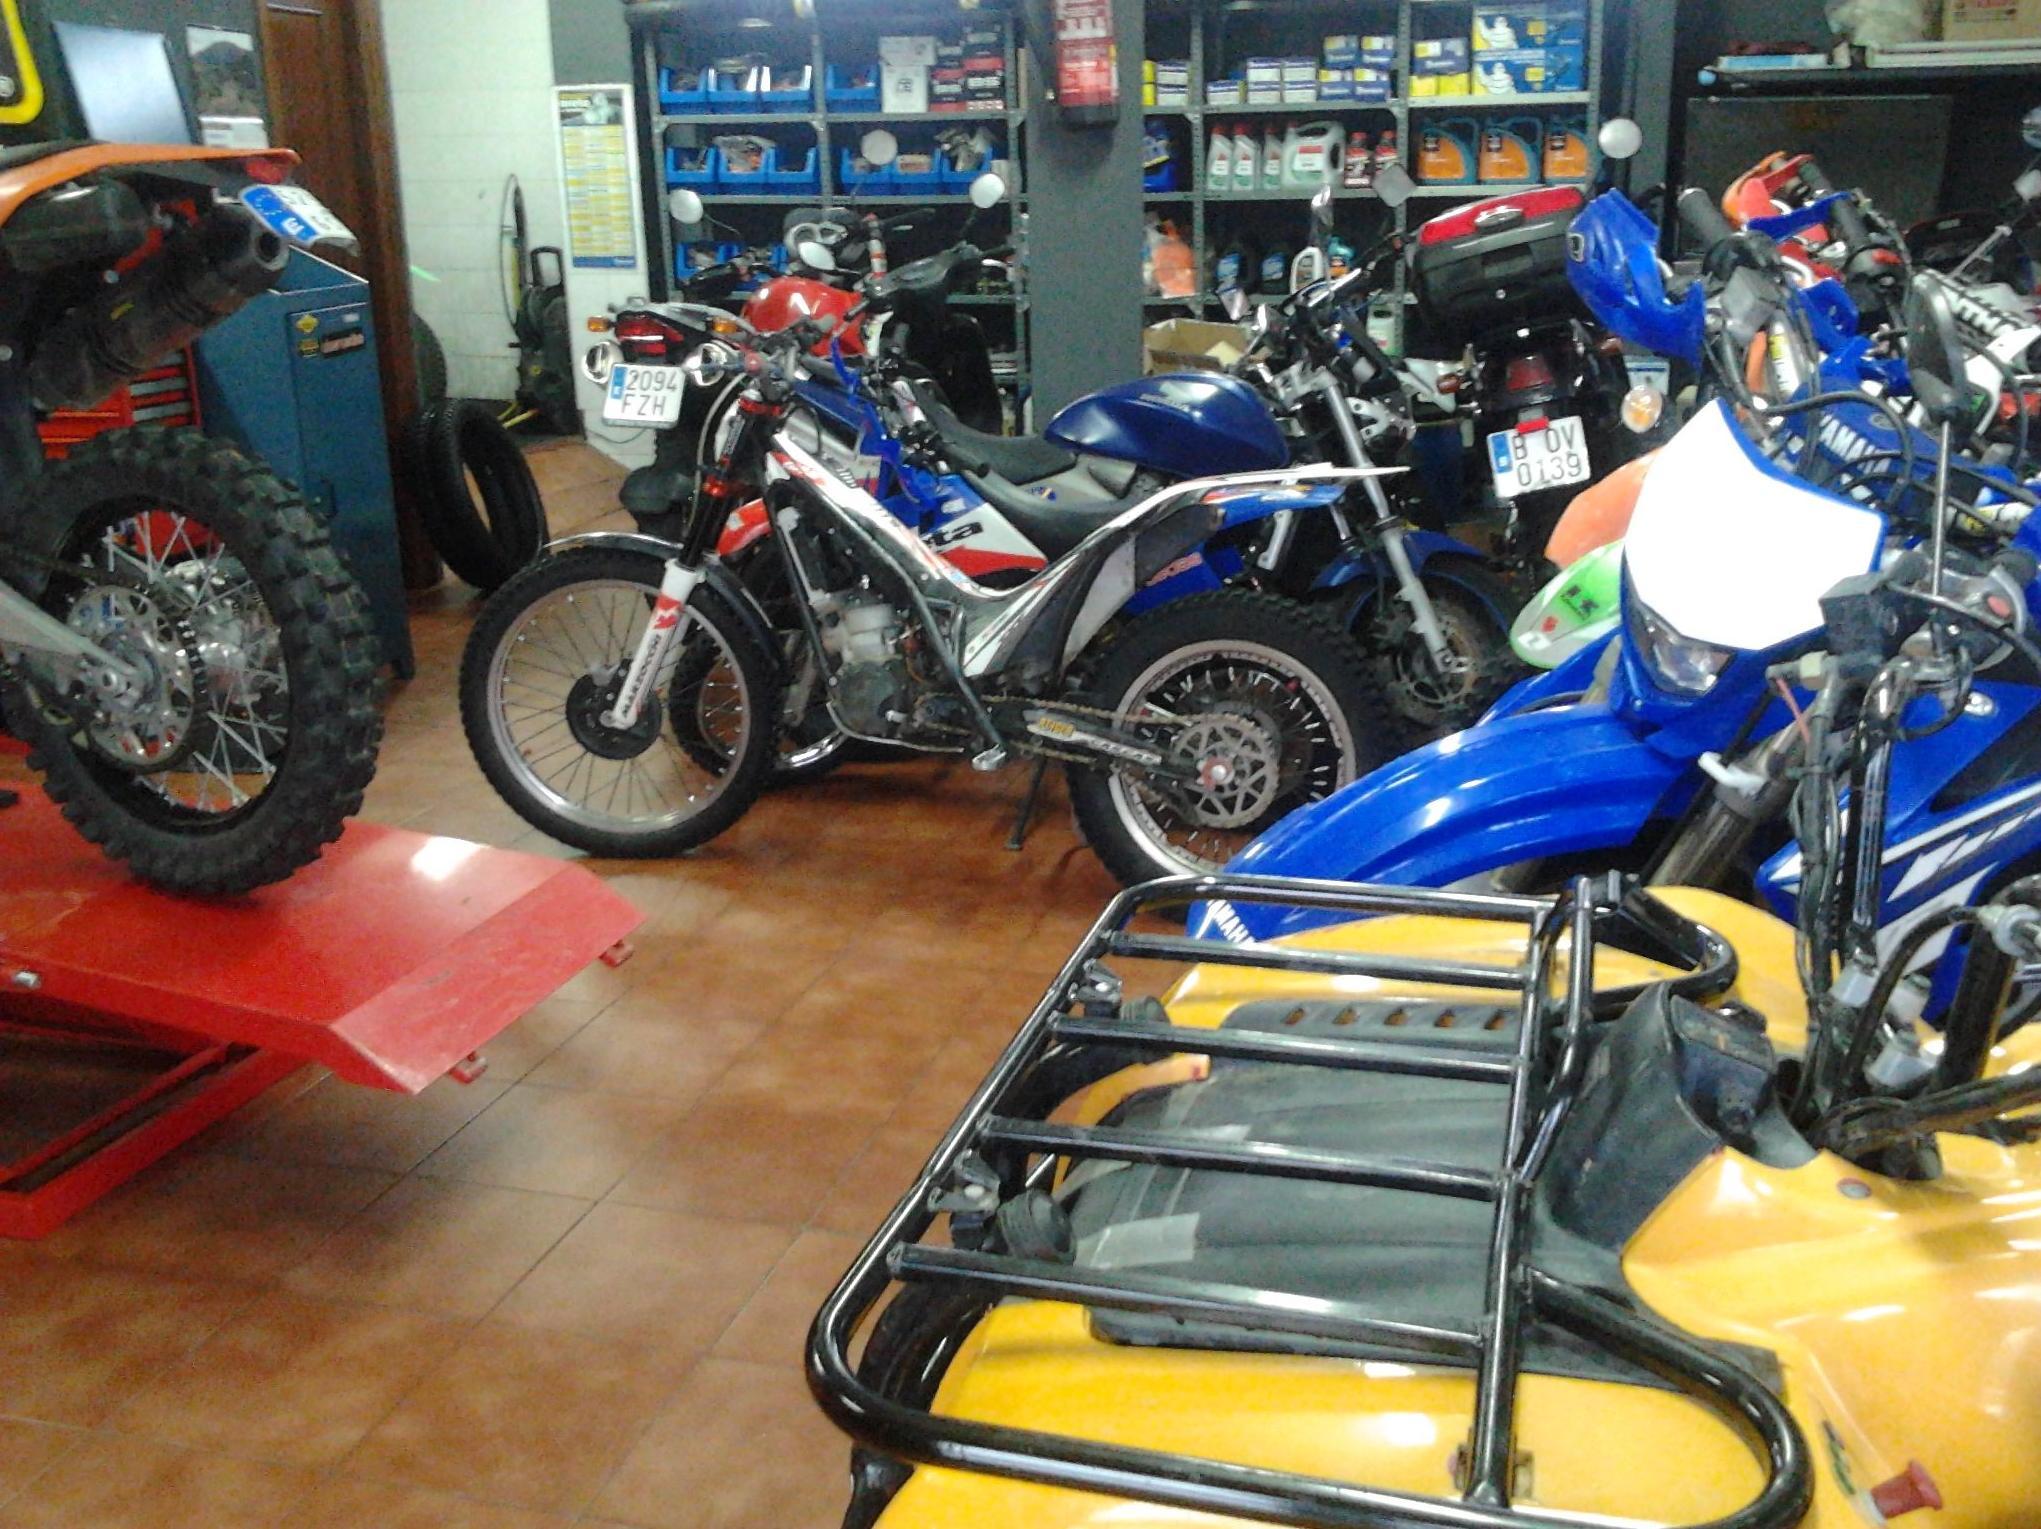 Taller de motos multimarca